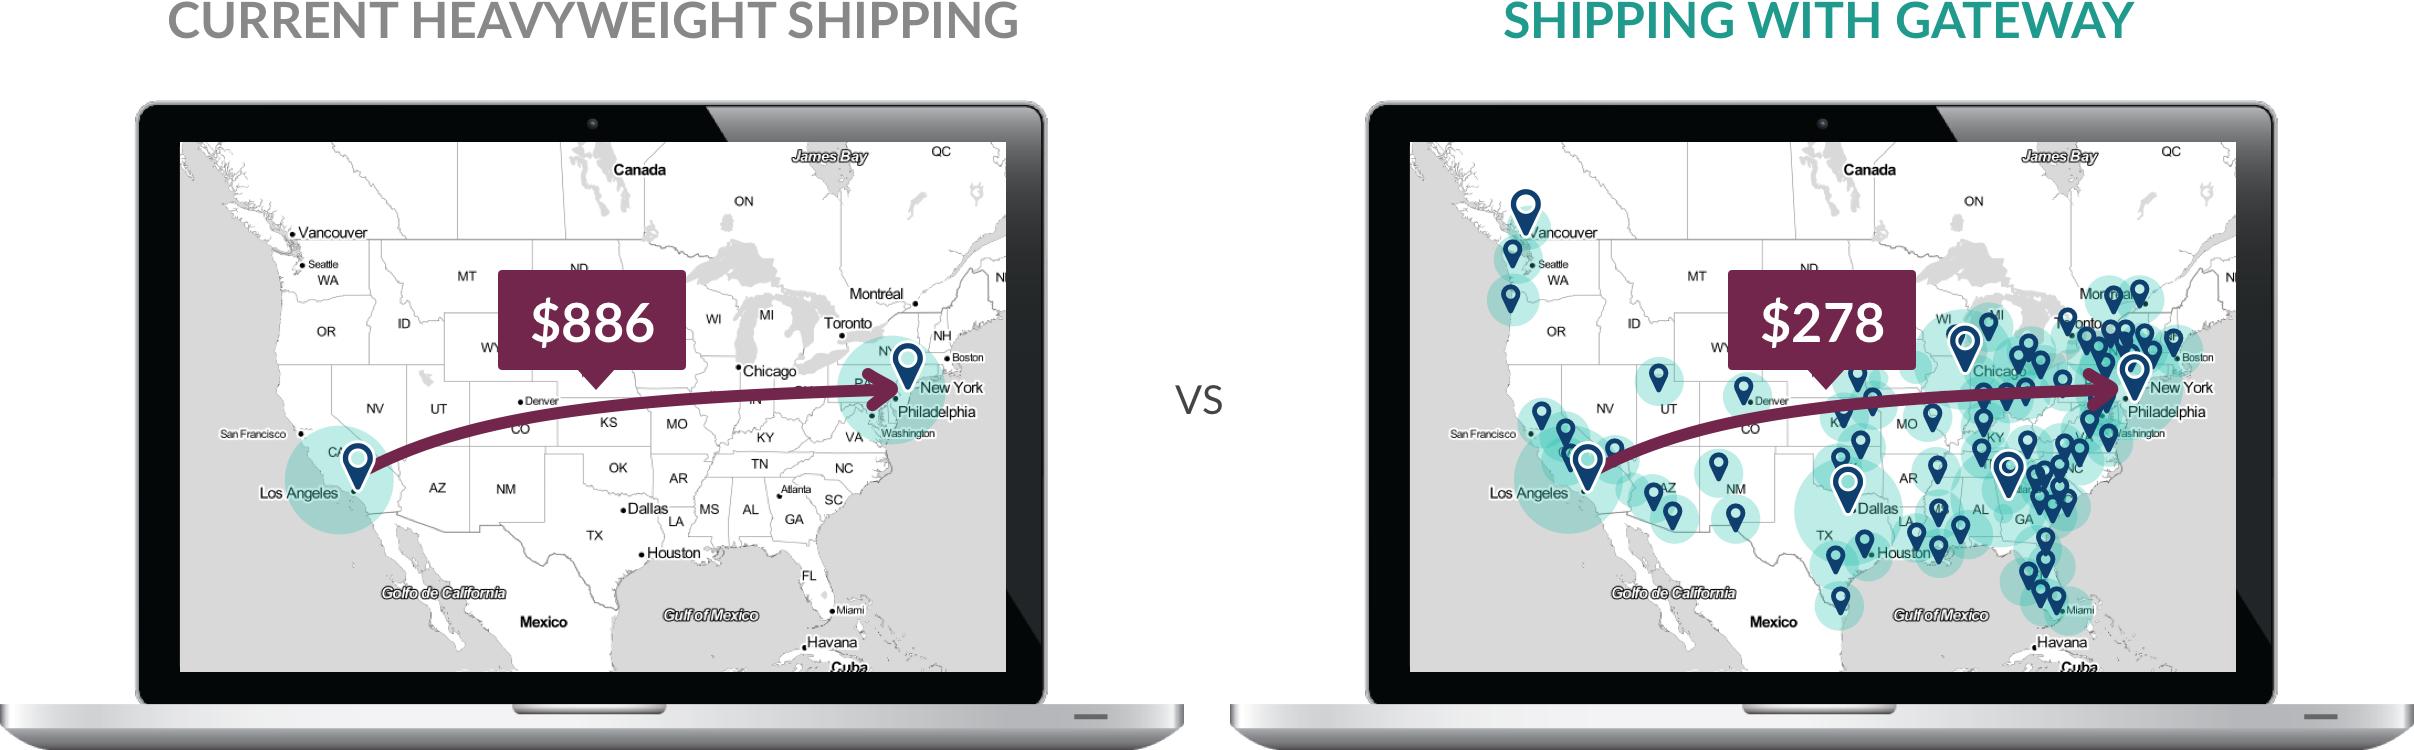 builddirects-gateway-shipping-networkv2